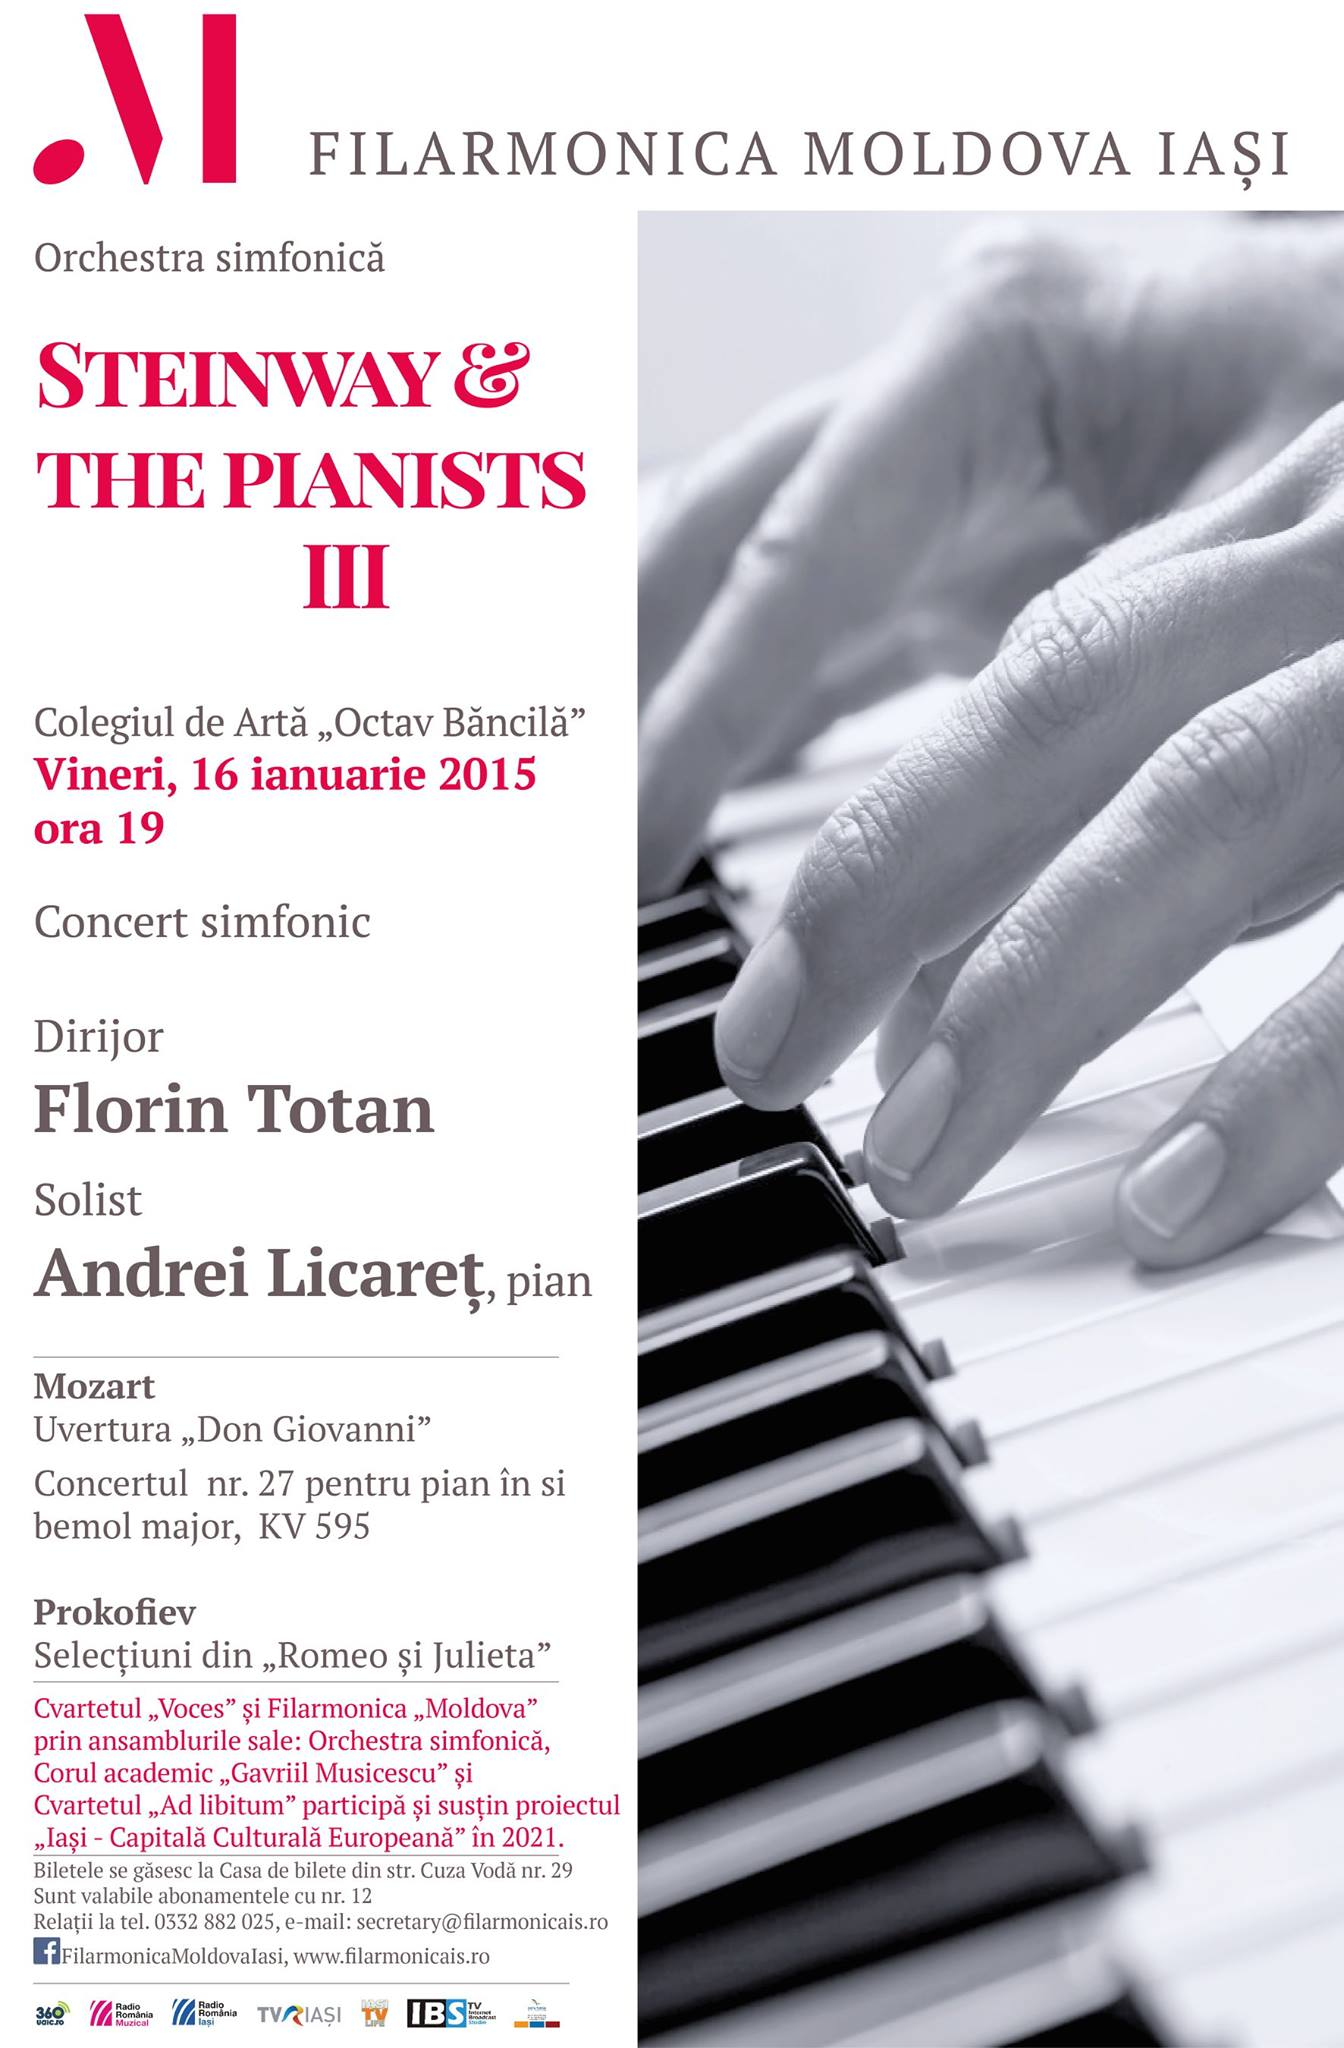 16 ian 2015 Filarmonica